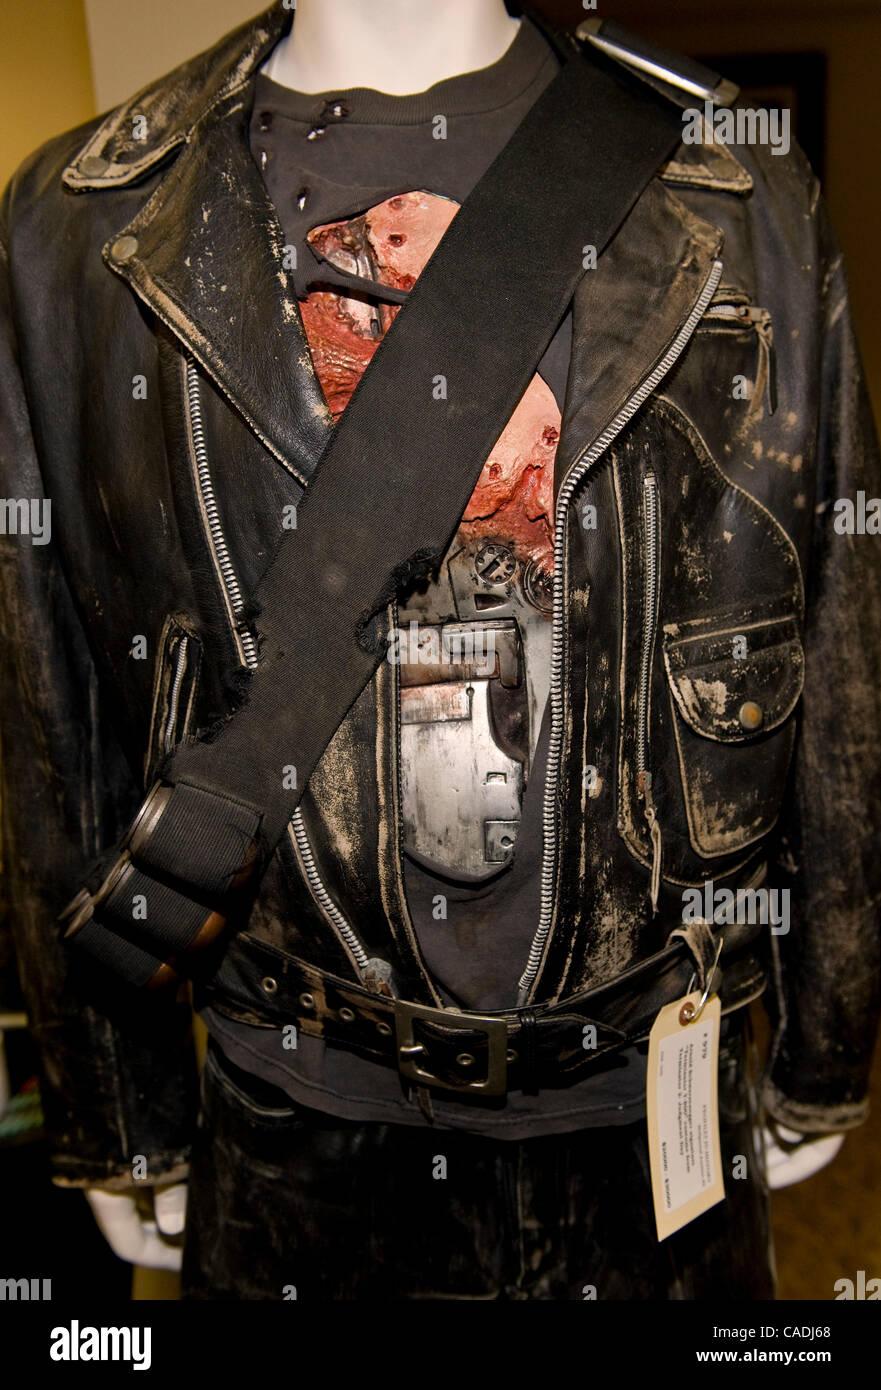 June 8, 2010 - Calabasas, California, USA -   Arnold Schwarzenegger signature 'Terminator T-800' costume - Stock Image